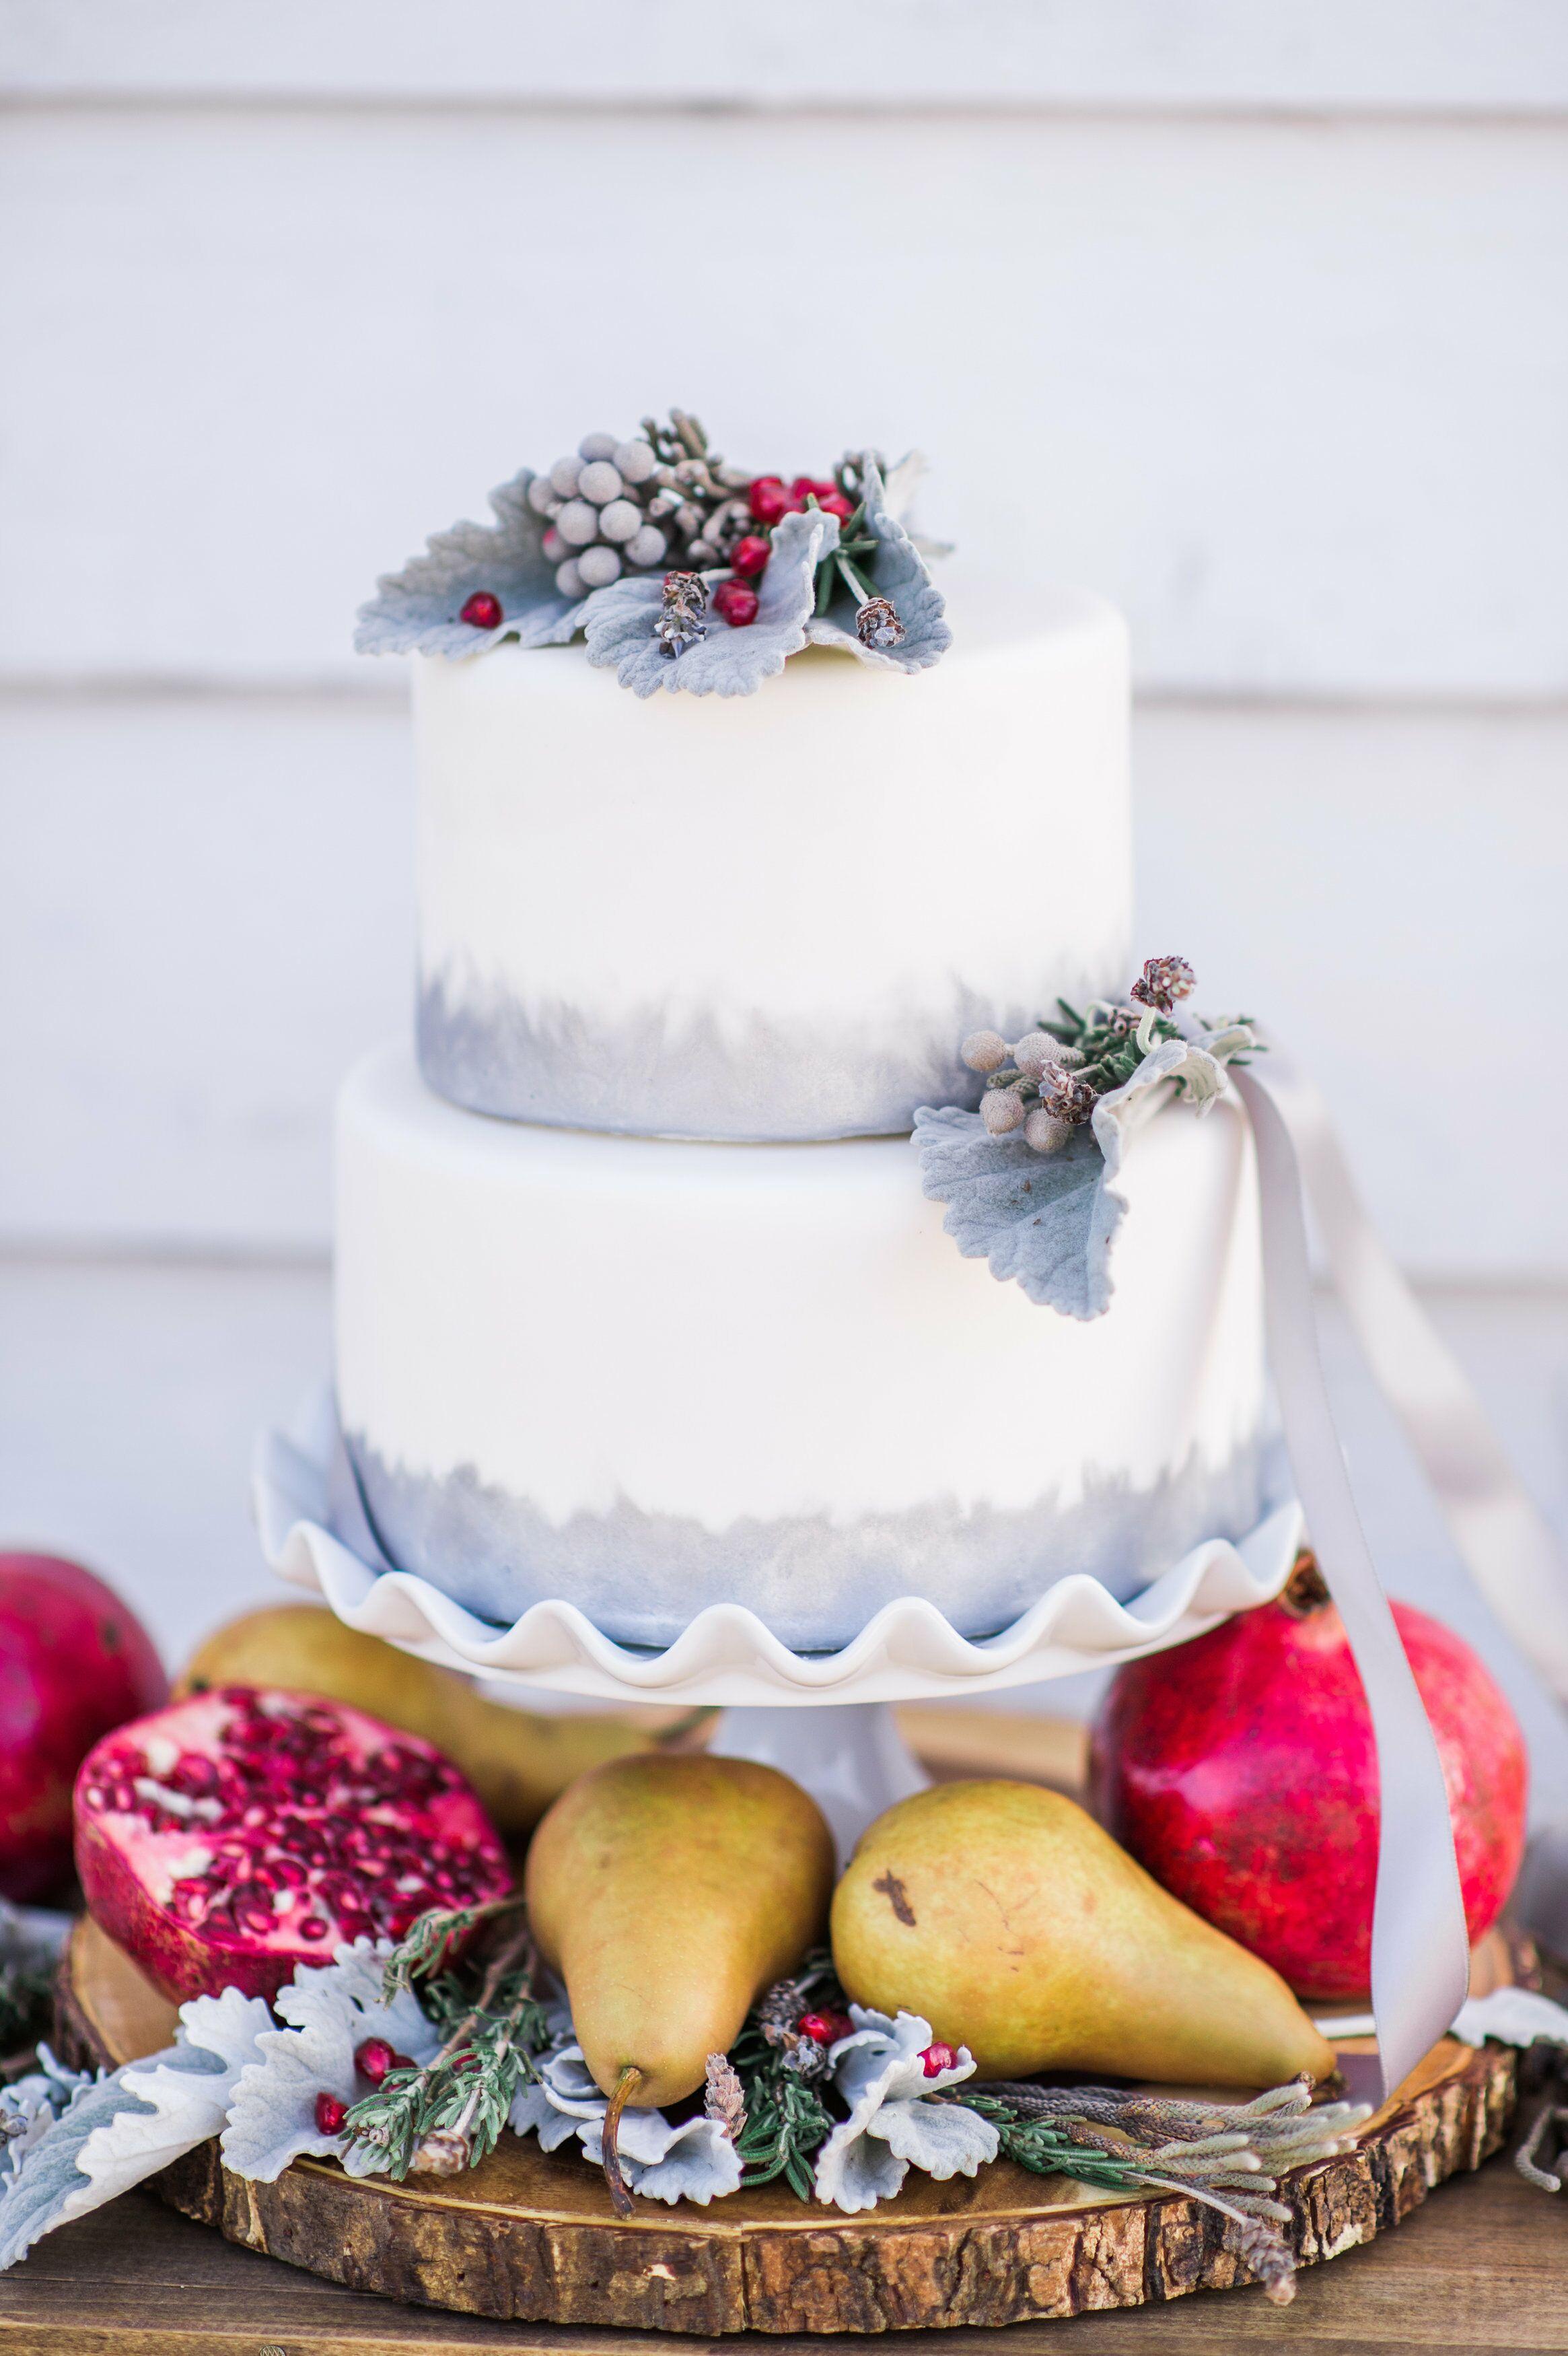 Wedding Cake Bakeries in Virginia Beach, VA - The Knot